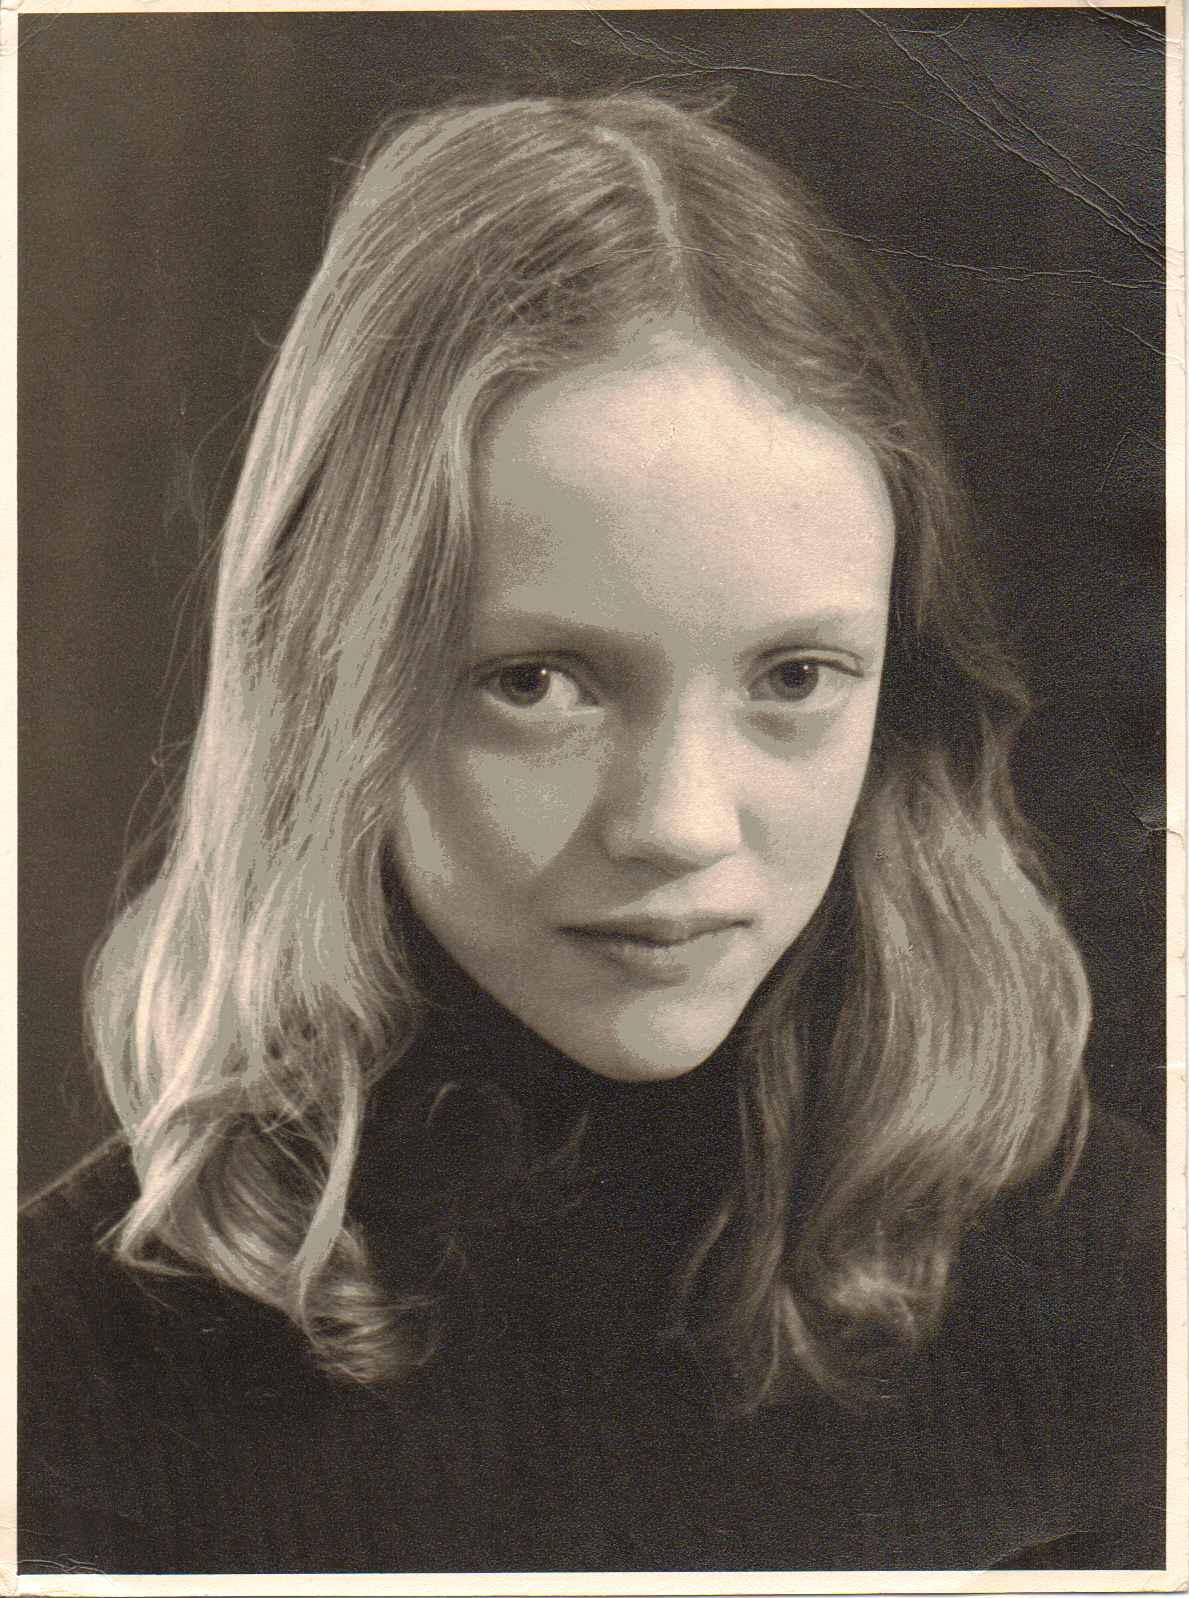 Sophie Neville in 1976